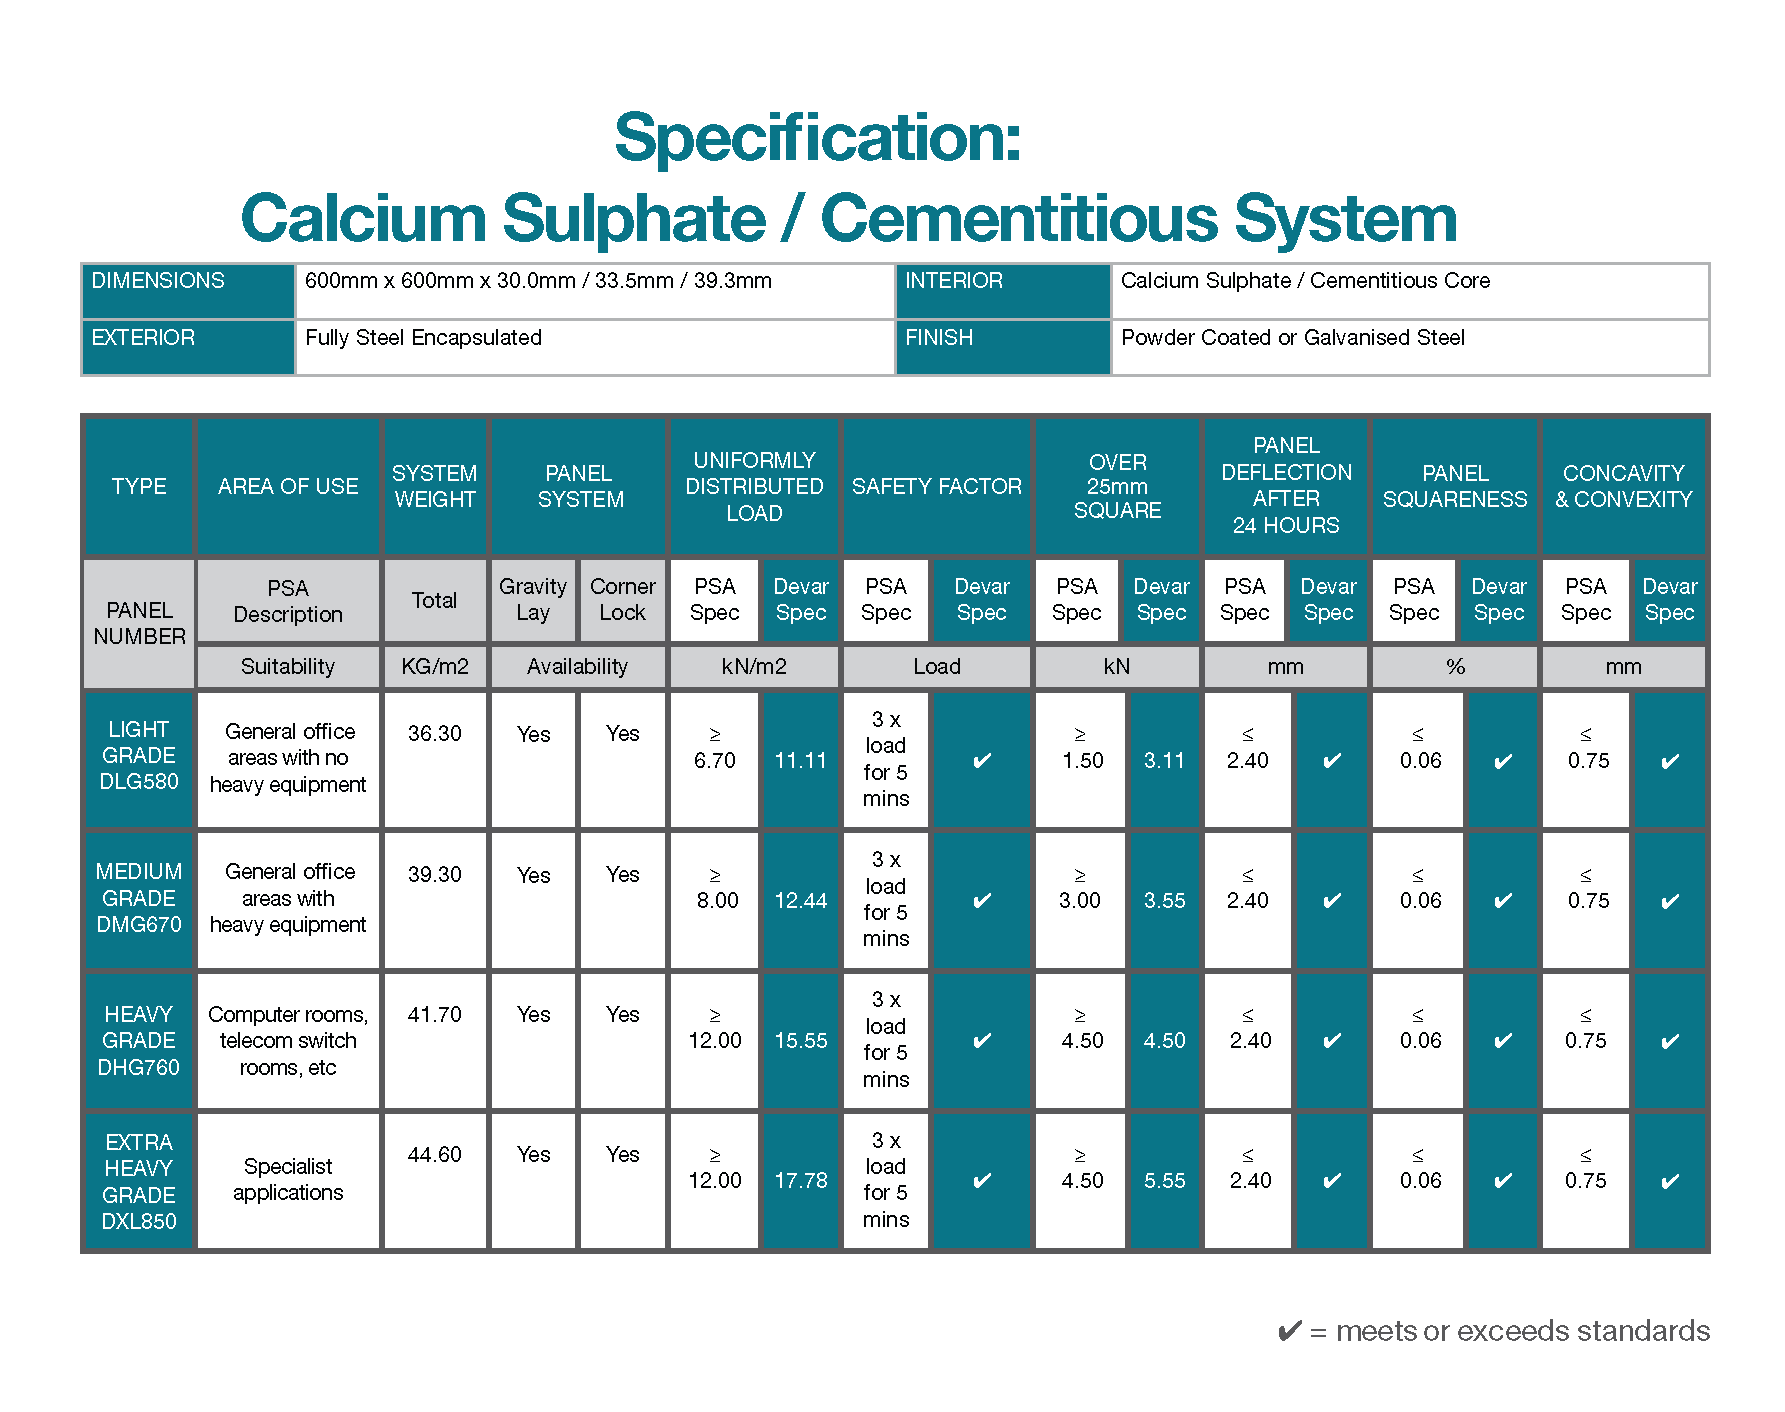 Access Flooring System Cementitious Core PSA Specification Table 2018 Devar